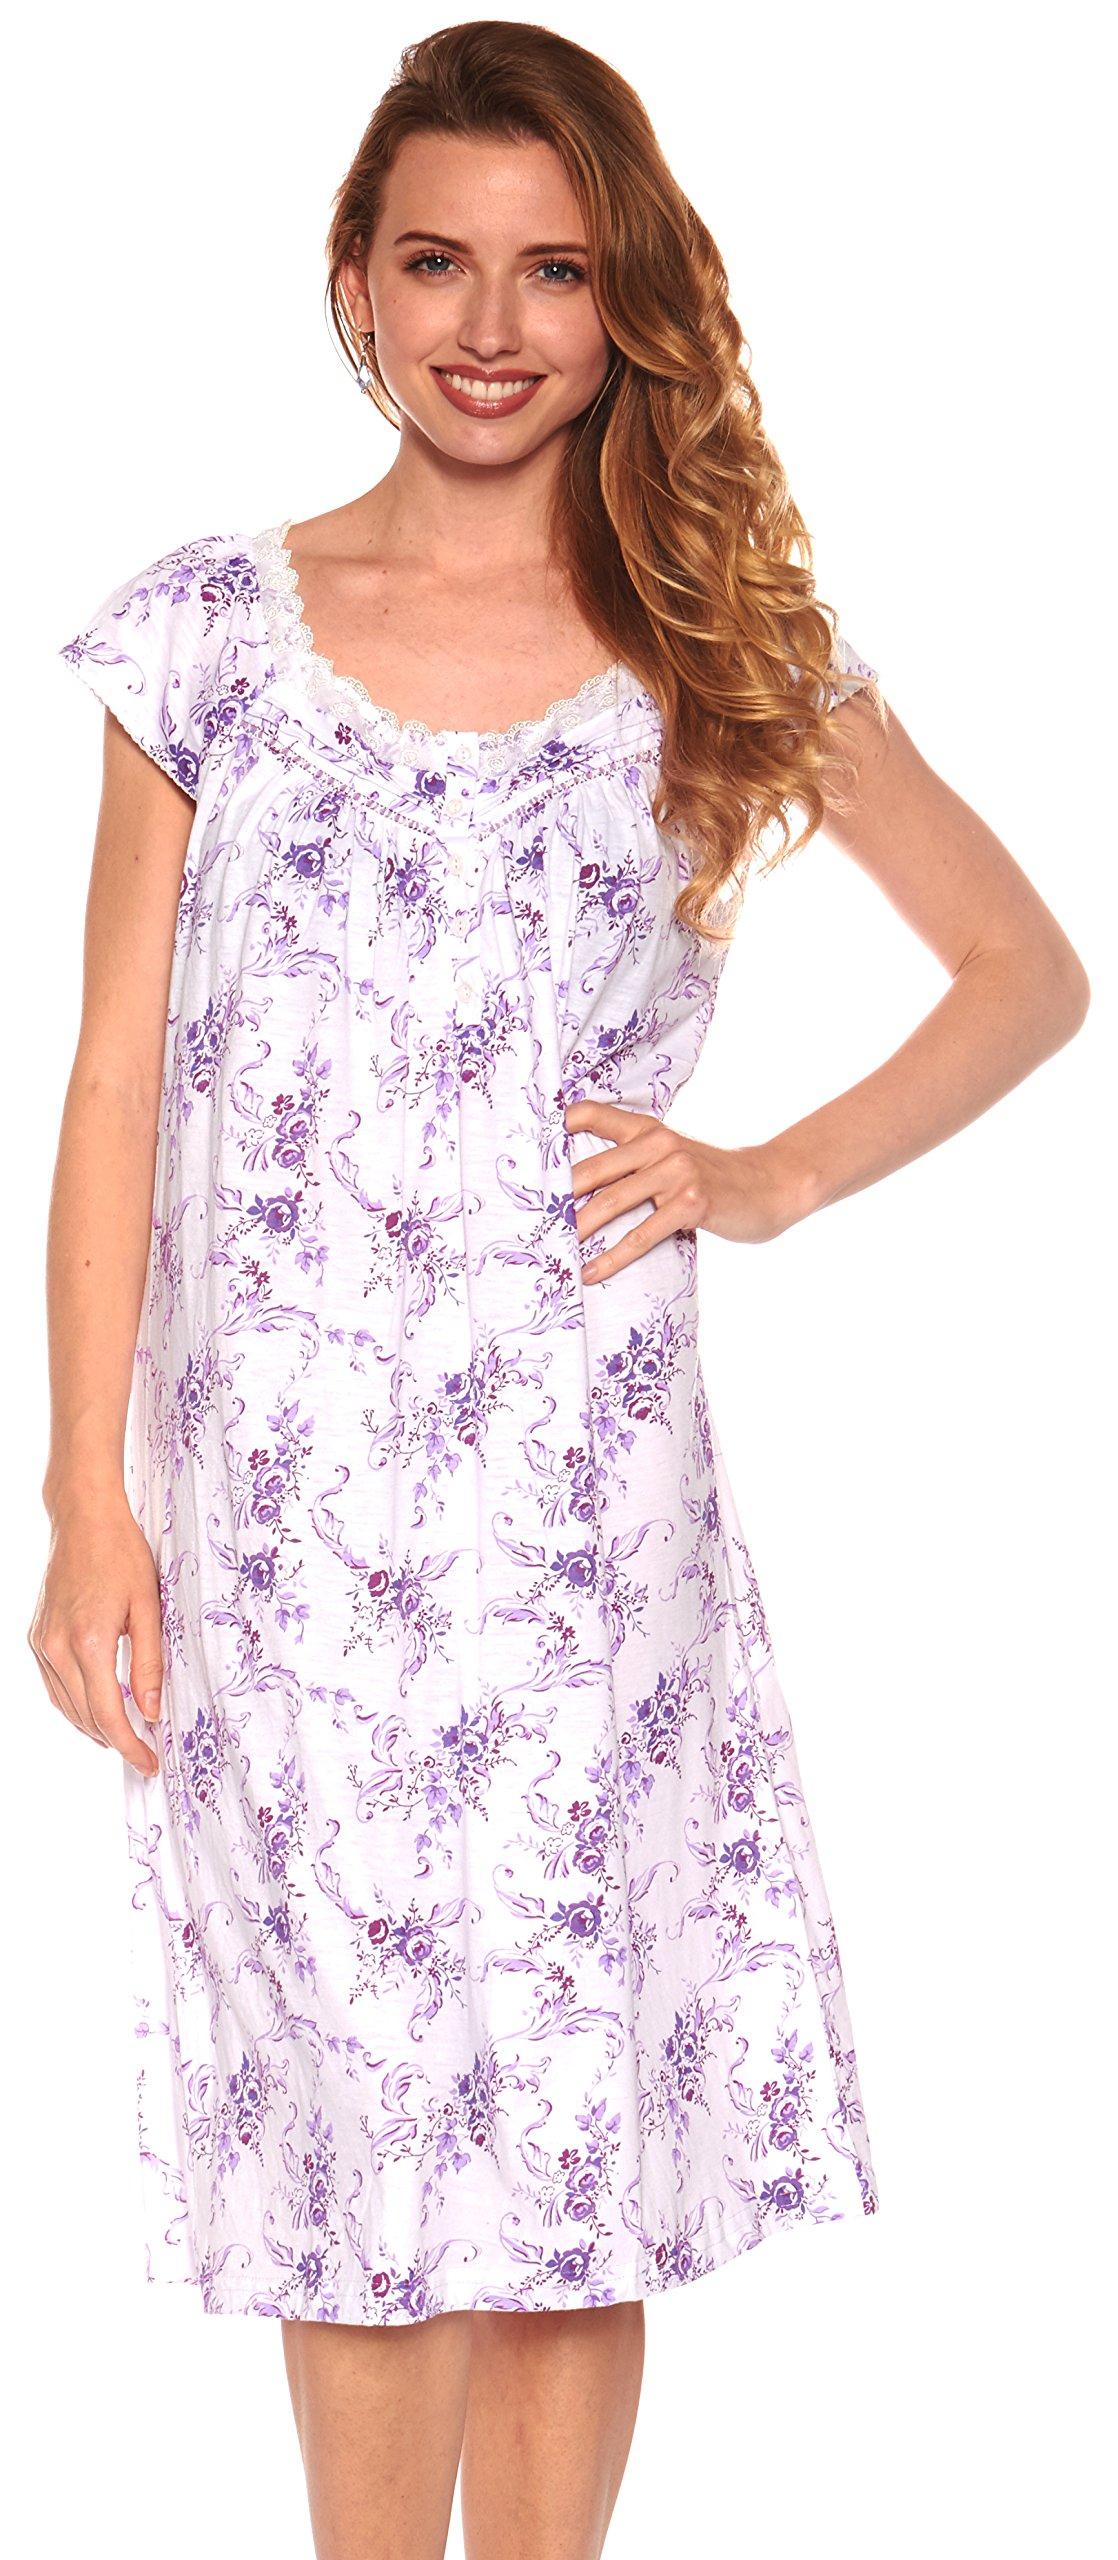 810 Women Nightgown Sleepwear Cotton Pajamas Sleeveless Sleep Dress Nightshirt